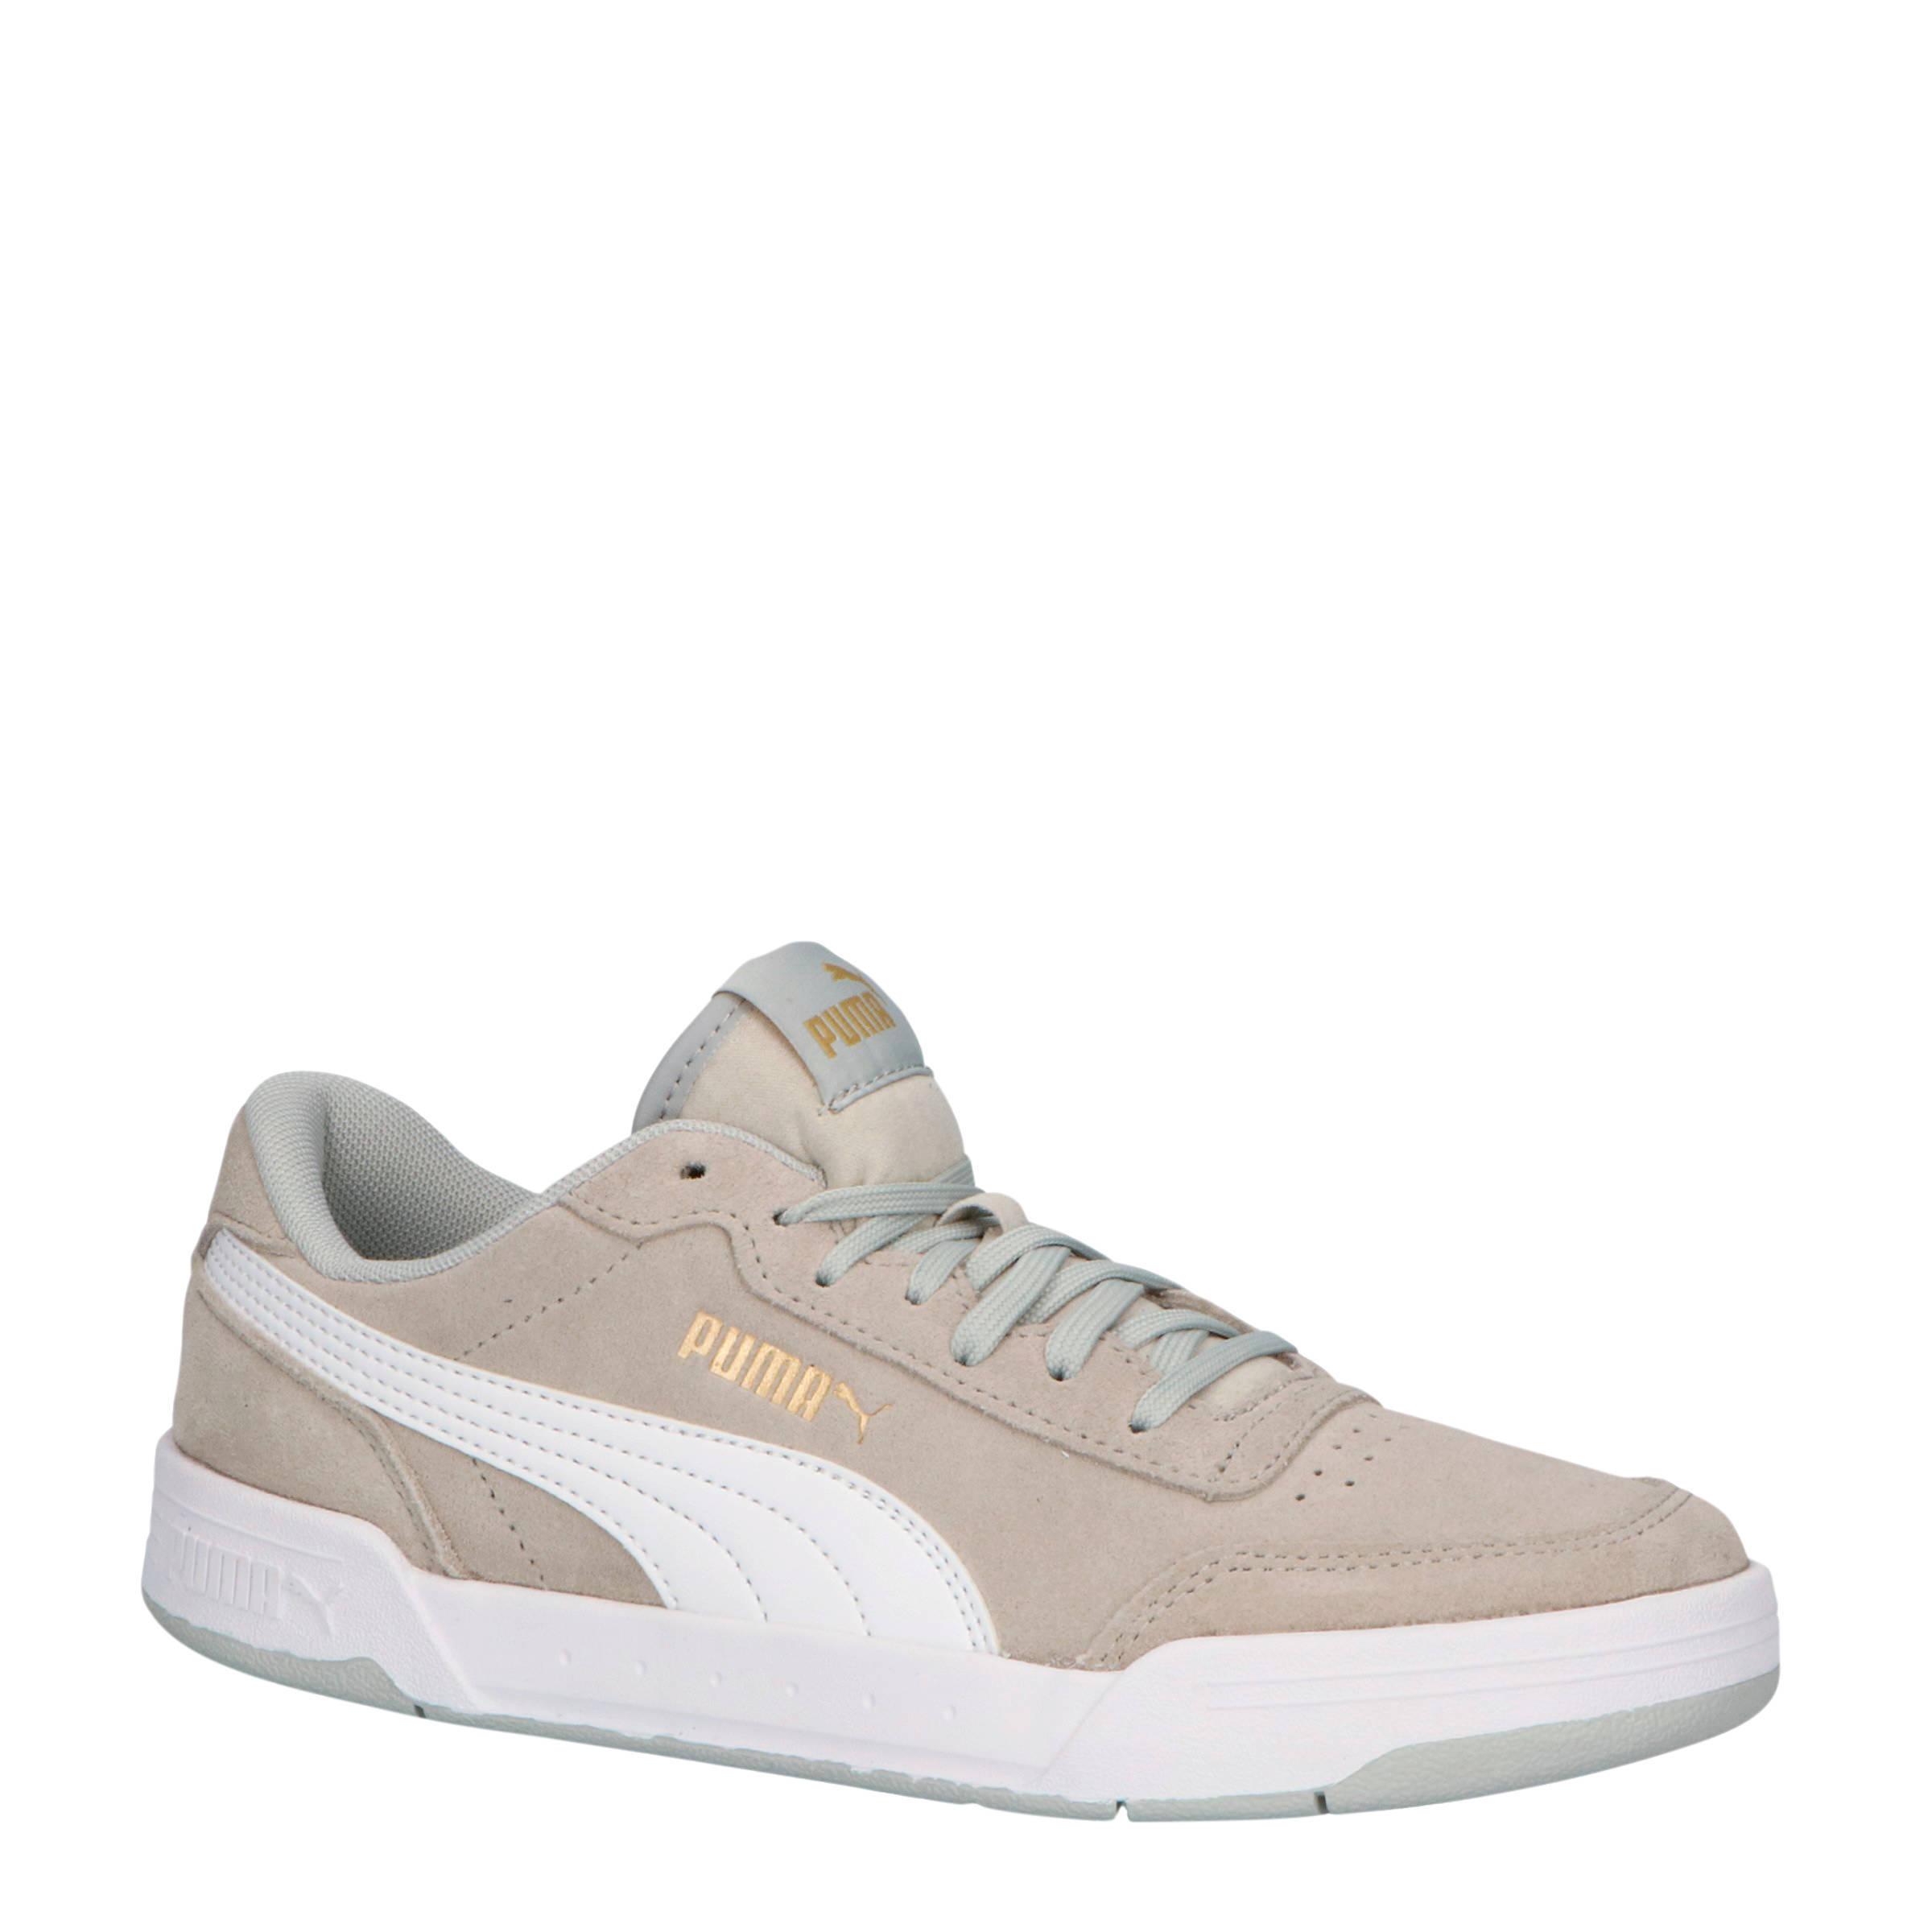 Puma Caracal SD Jr suede sneakers grijs/wit | wehkamp